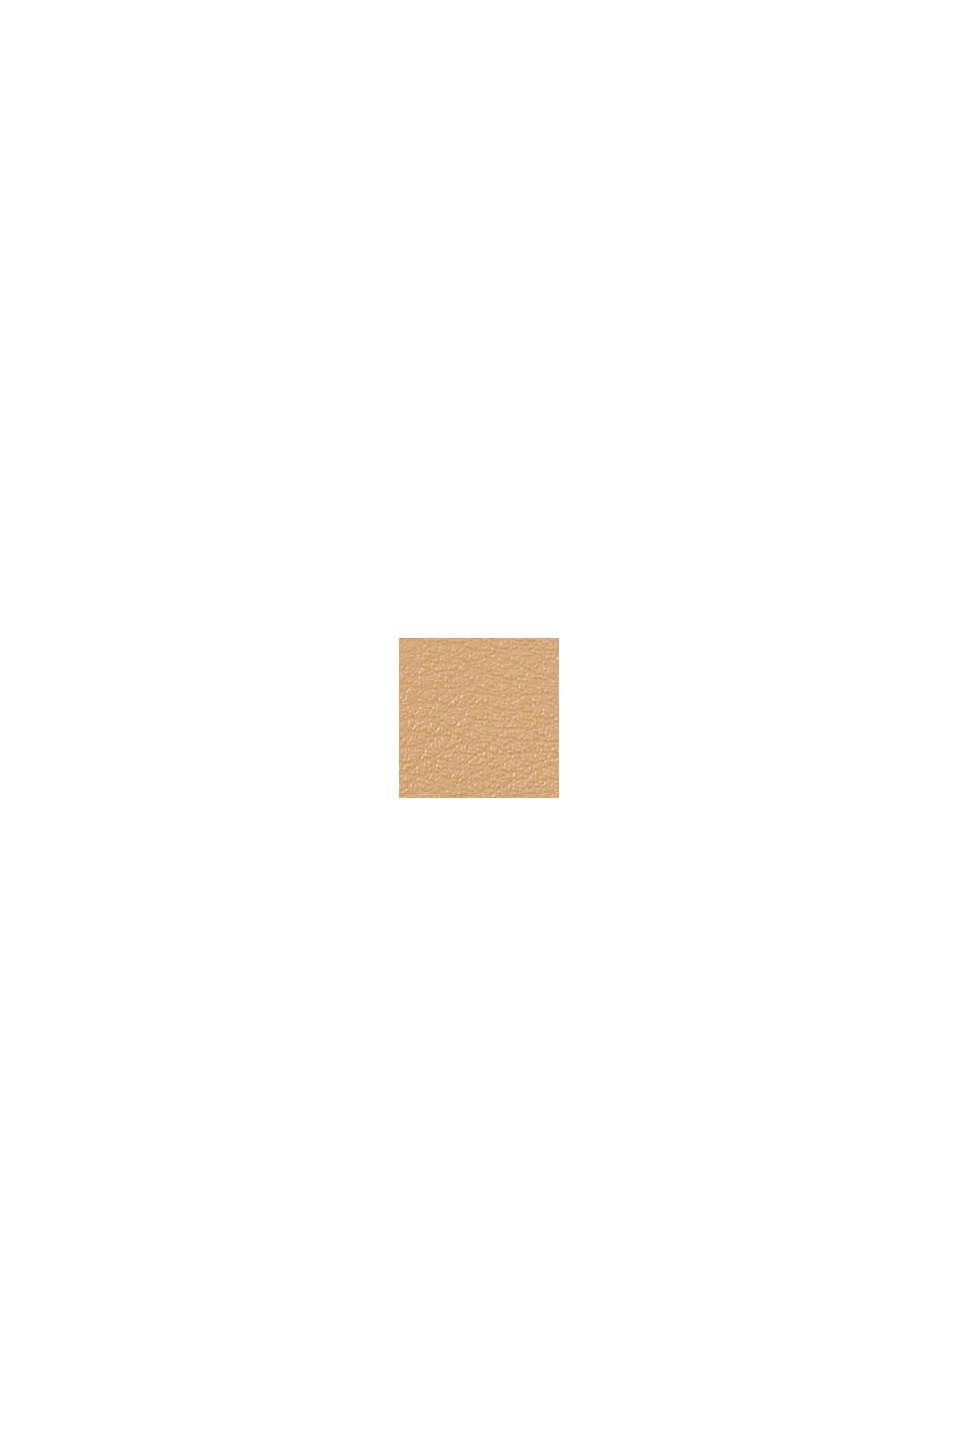 Hallie T. Kosmetik-Tasche in Leder-Optik, CAMEL, swatch